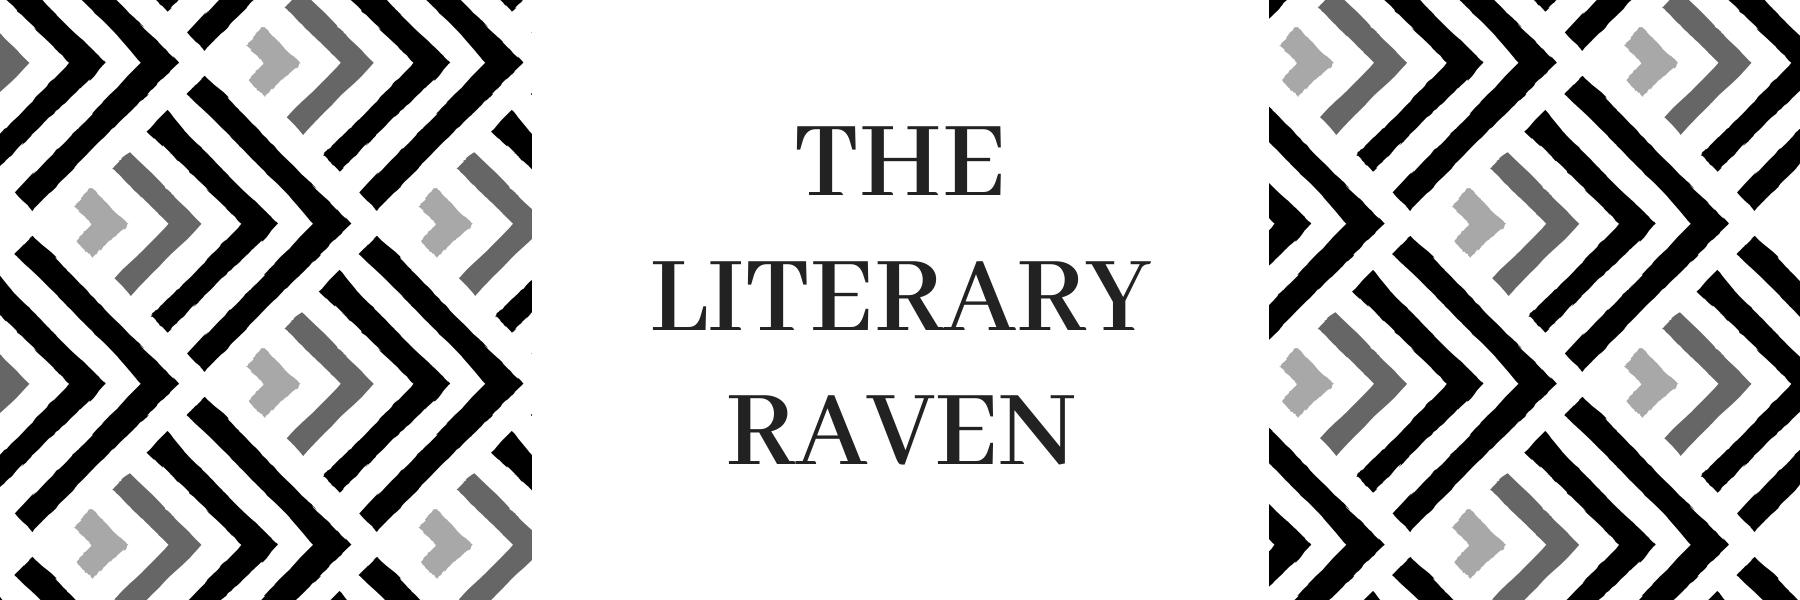 the literary raven.